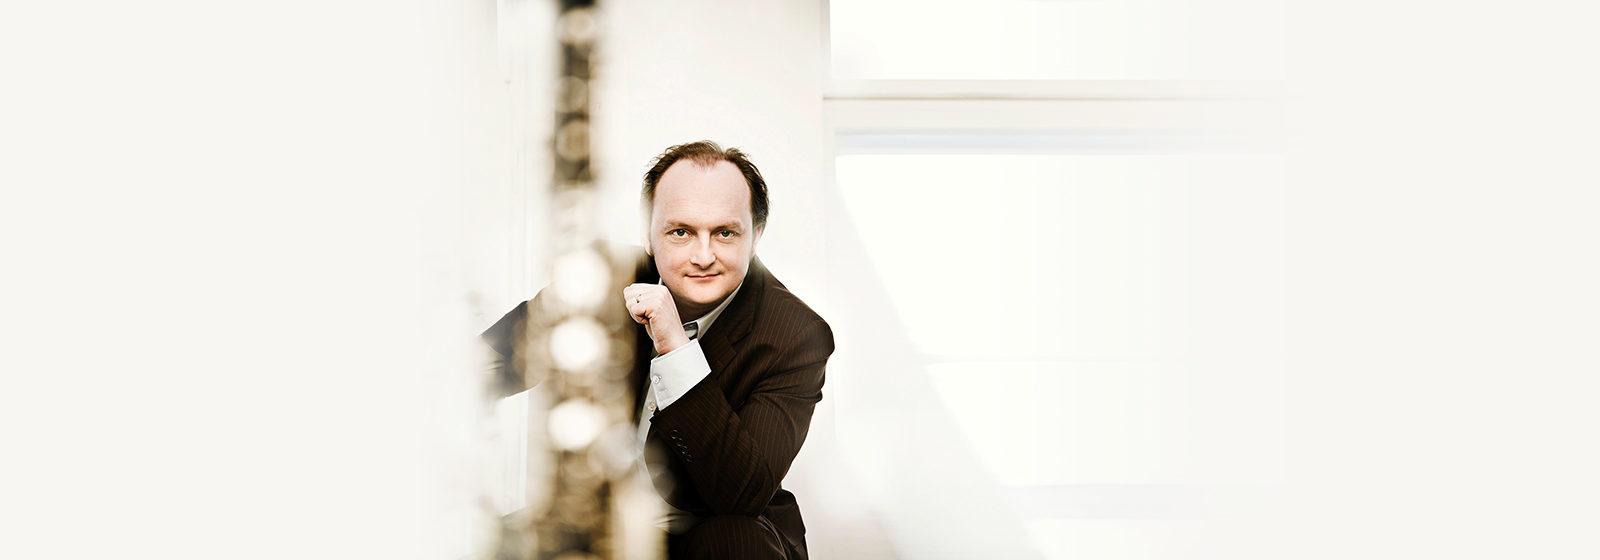 François Leleux a Nemzeti Filharmonikus Zenekarral